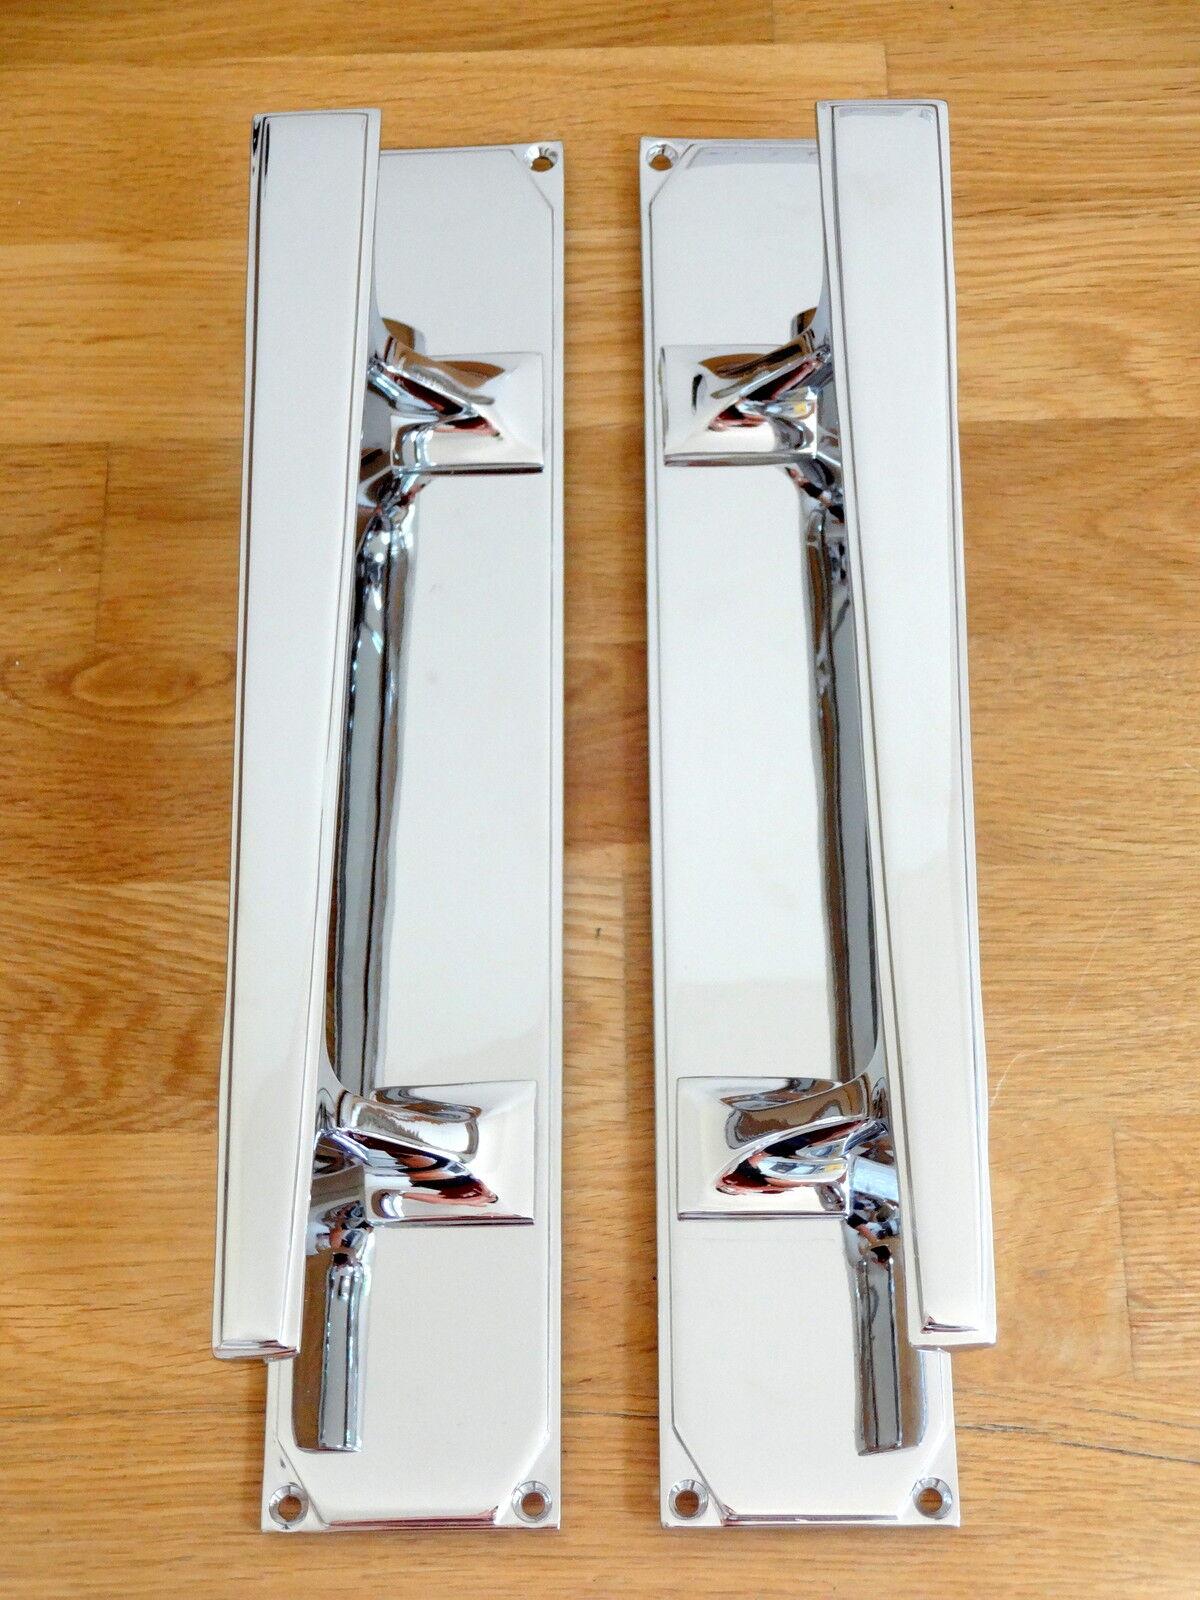 CHROME DOOR PULL HANDLES (PAIRS) ART DECO KNOBS PLATES FINGER PUSH EDWARDIAN